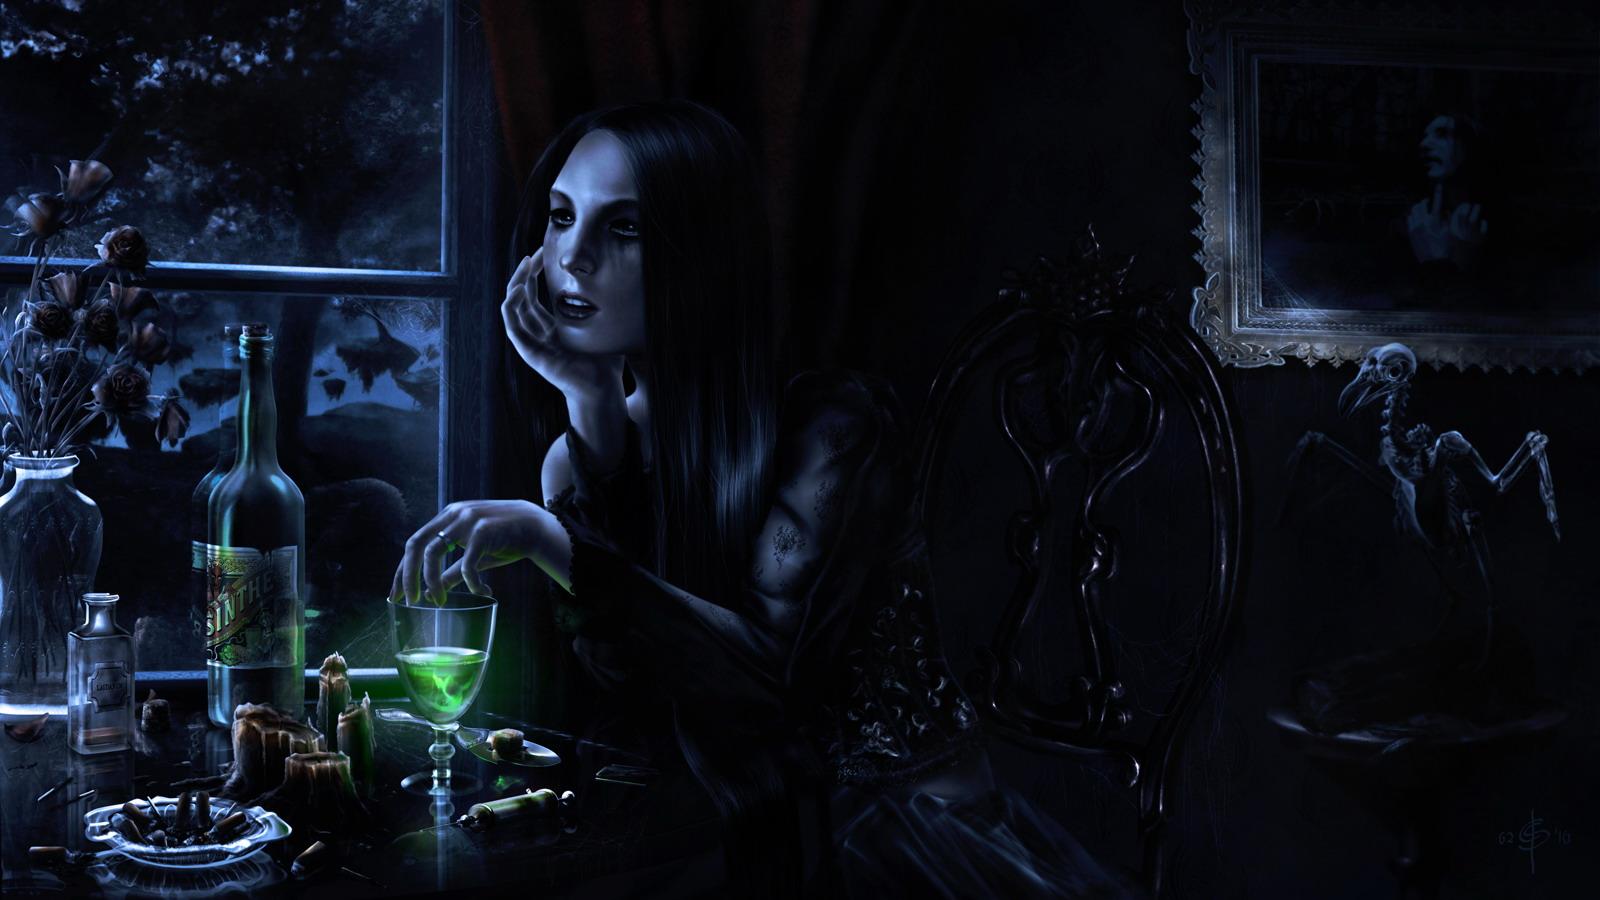 Gothic vampire wallpaper 1600x900 28451 WallpaperUP 1600x900